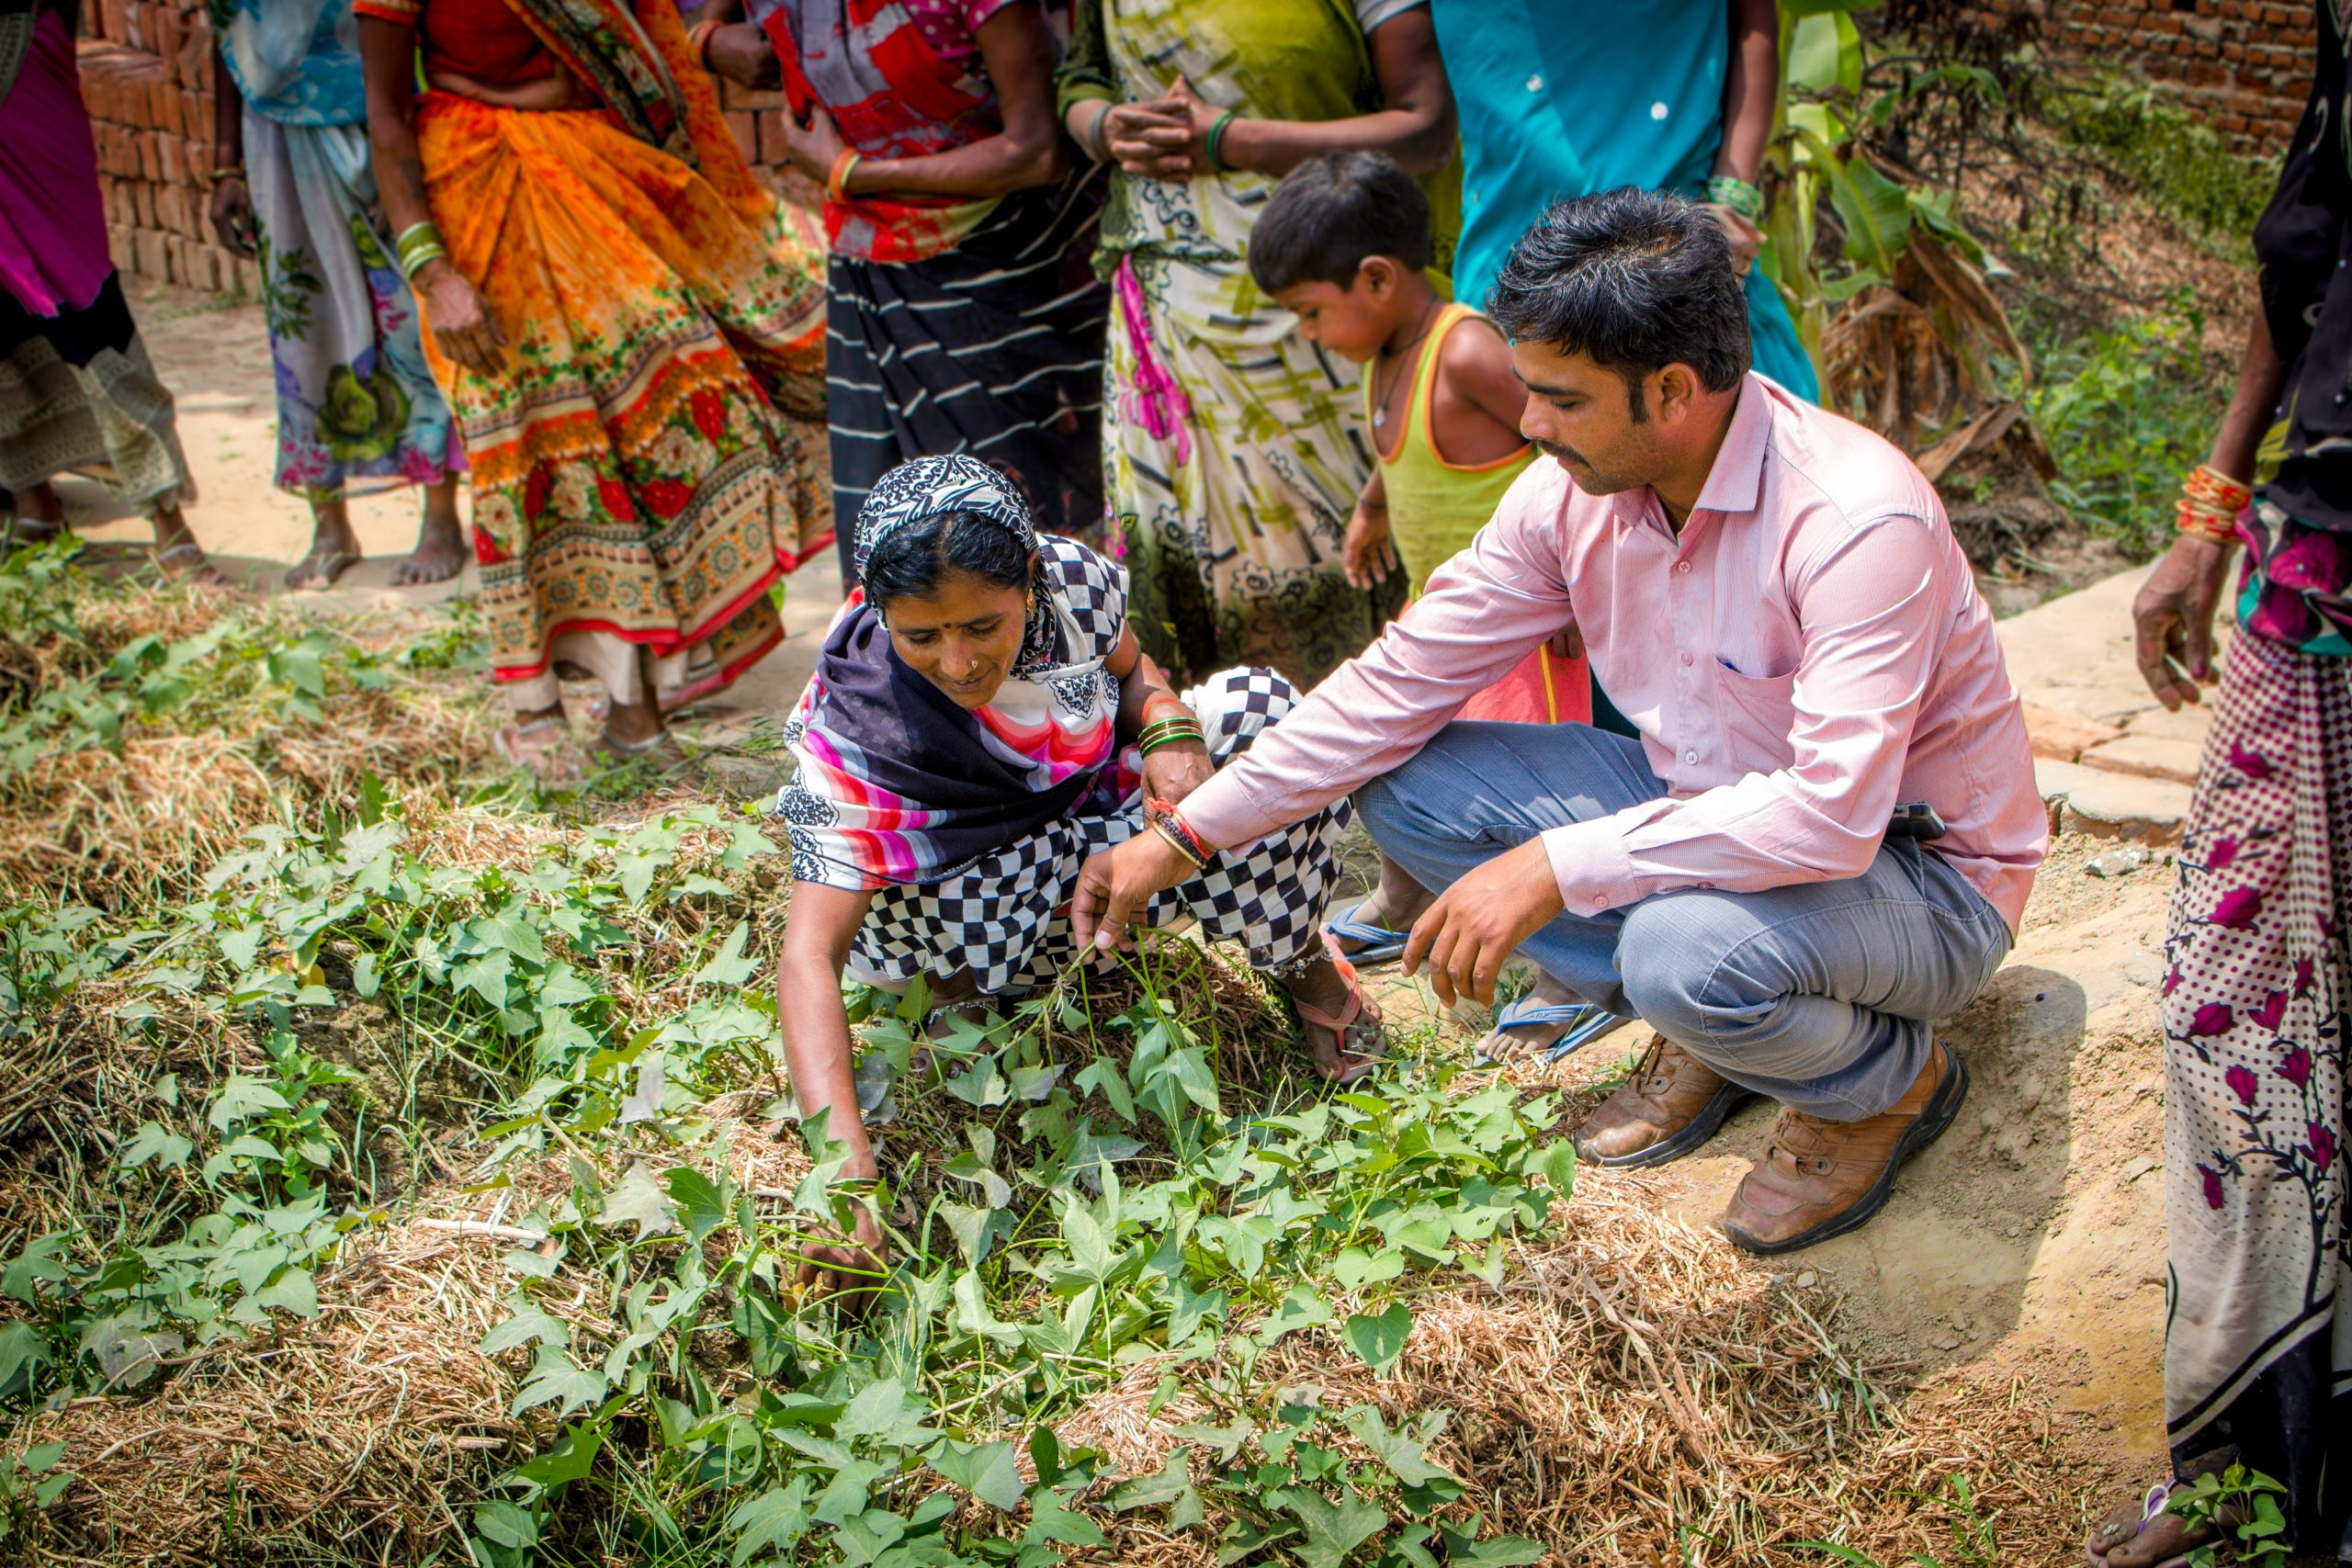 People examining crops